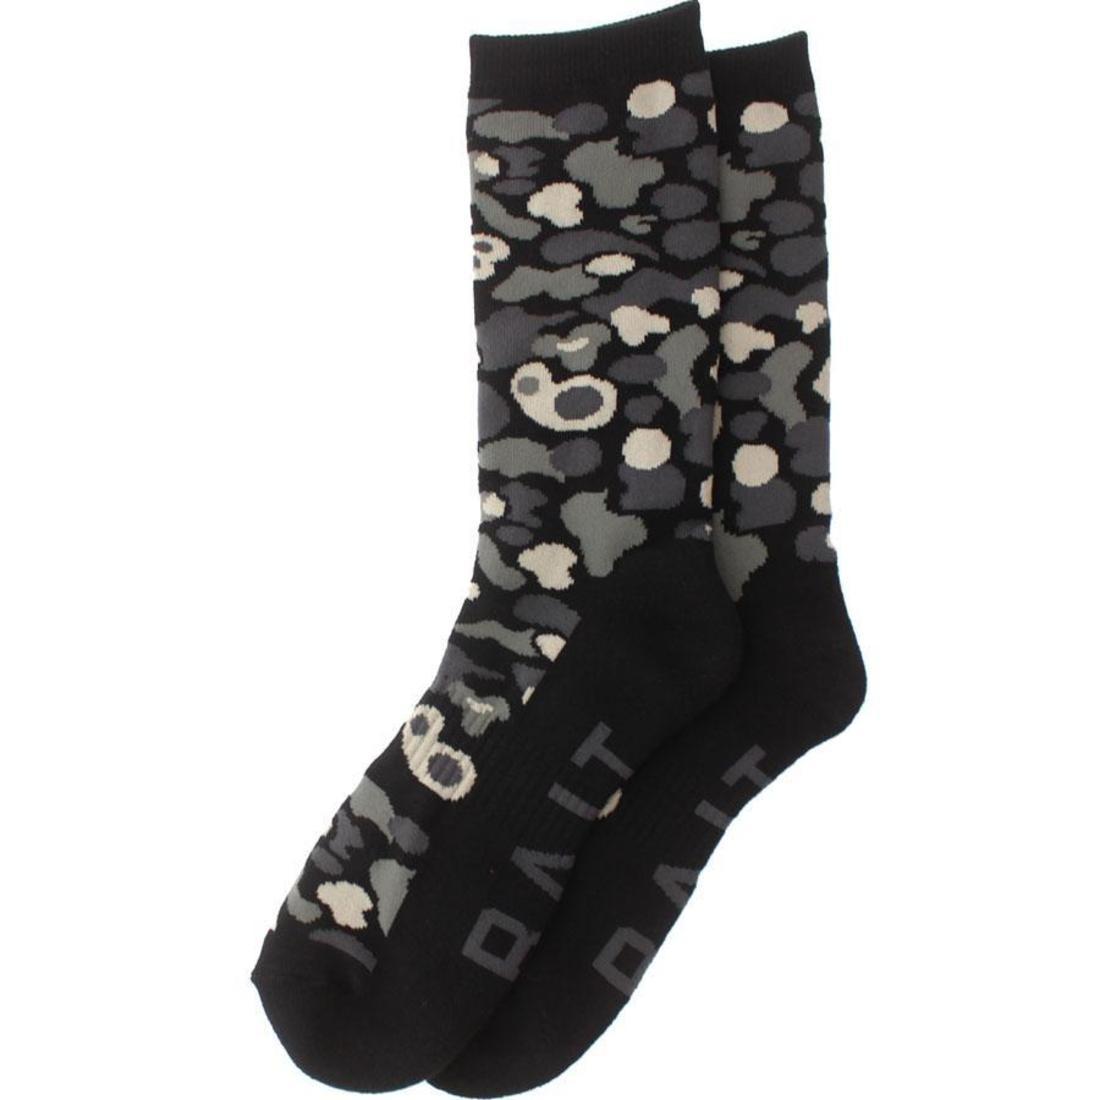 BAIT Camo Crew Socks (camo / black) 1S